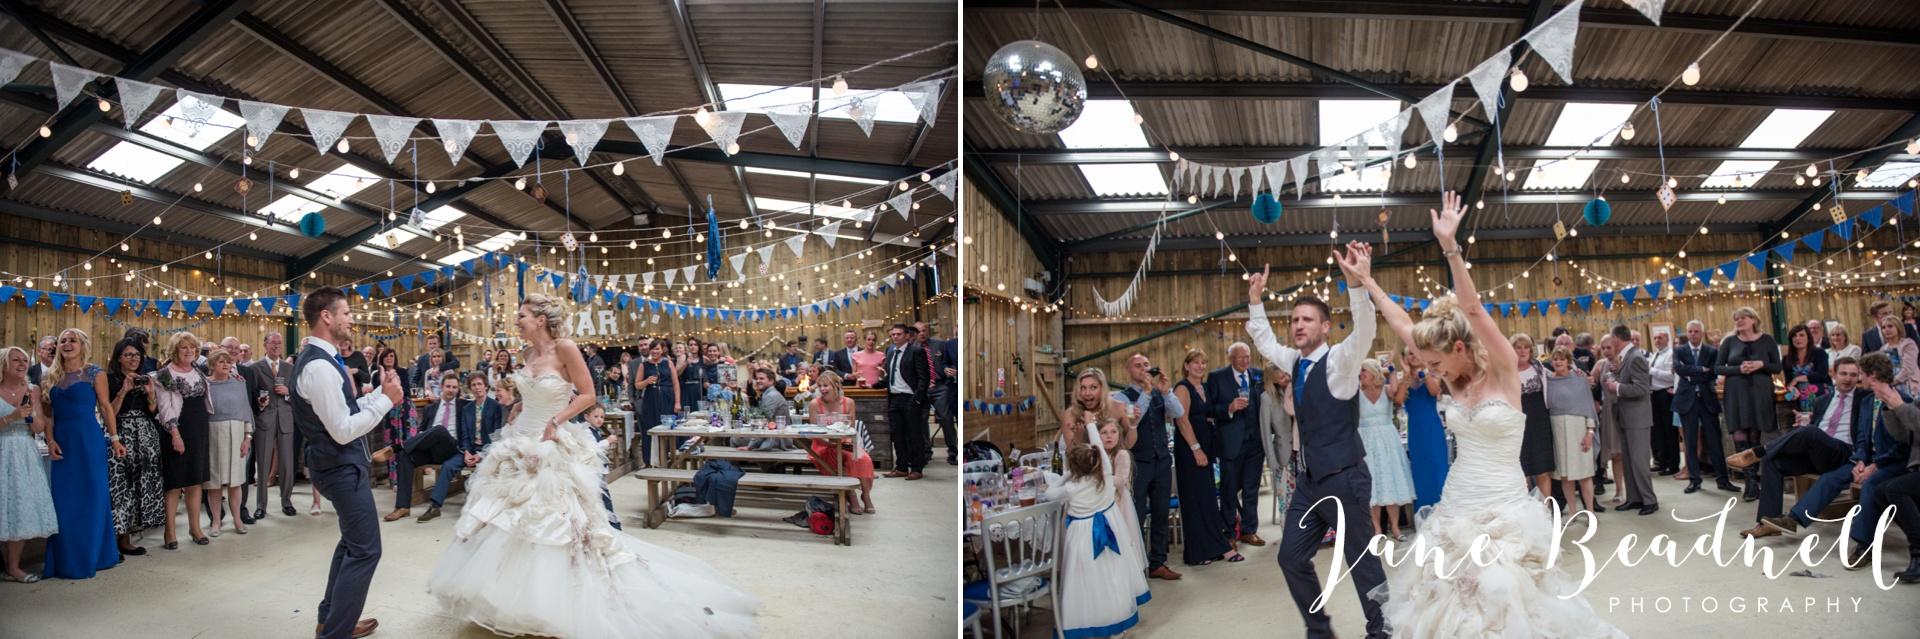 Hill Top Farm Wedding Photography Masham by Jane Beadnell Photography_0115